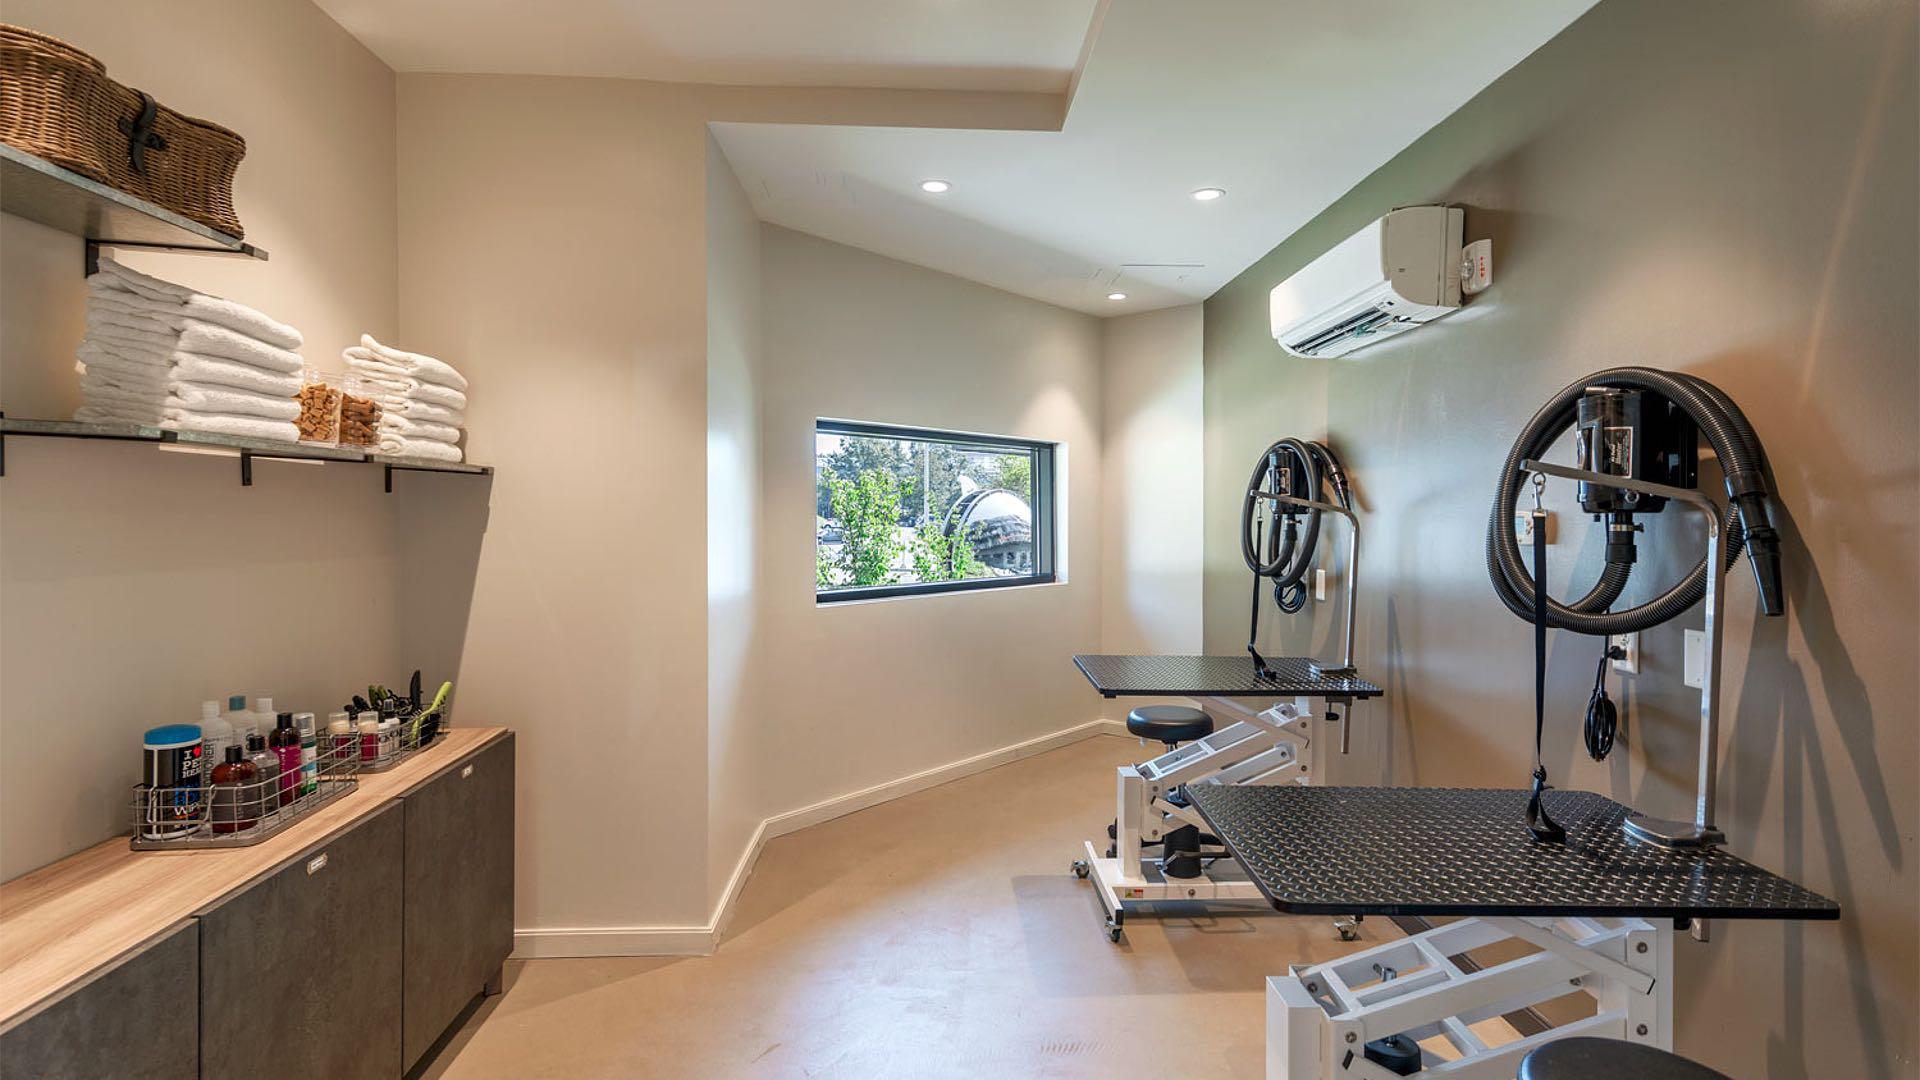 amenities Image 7